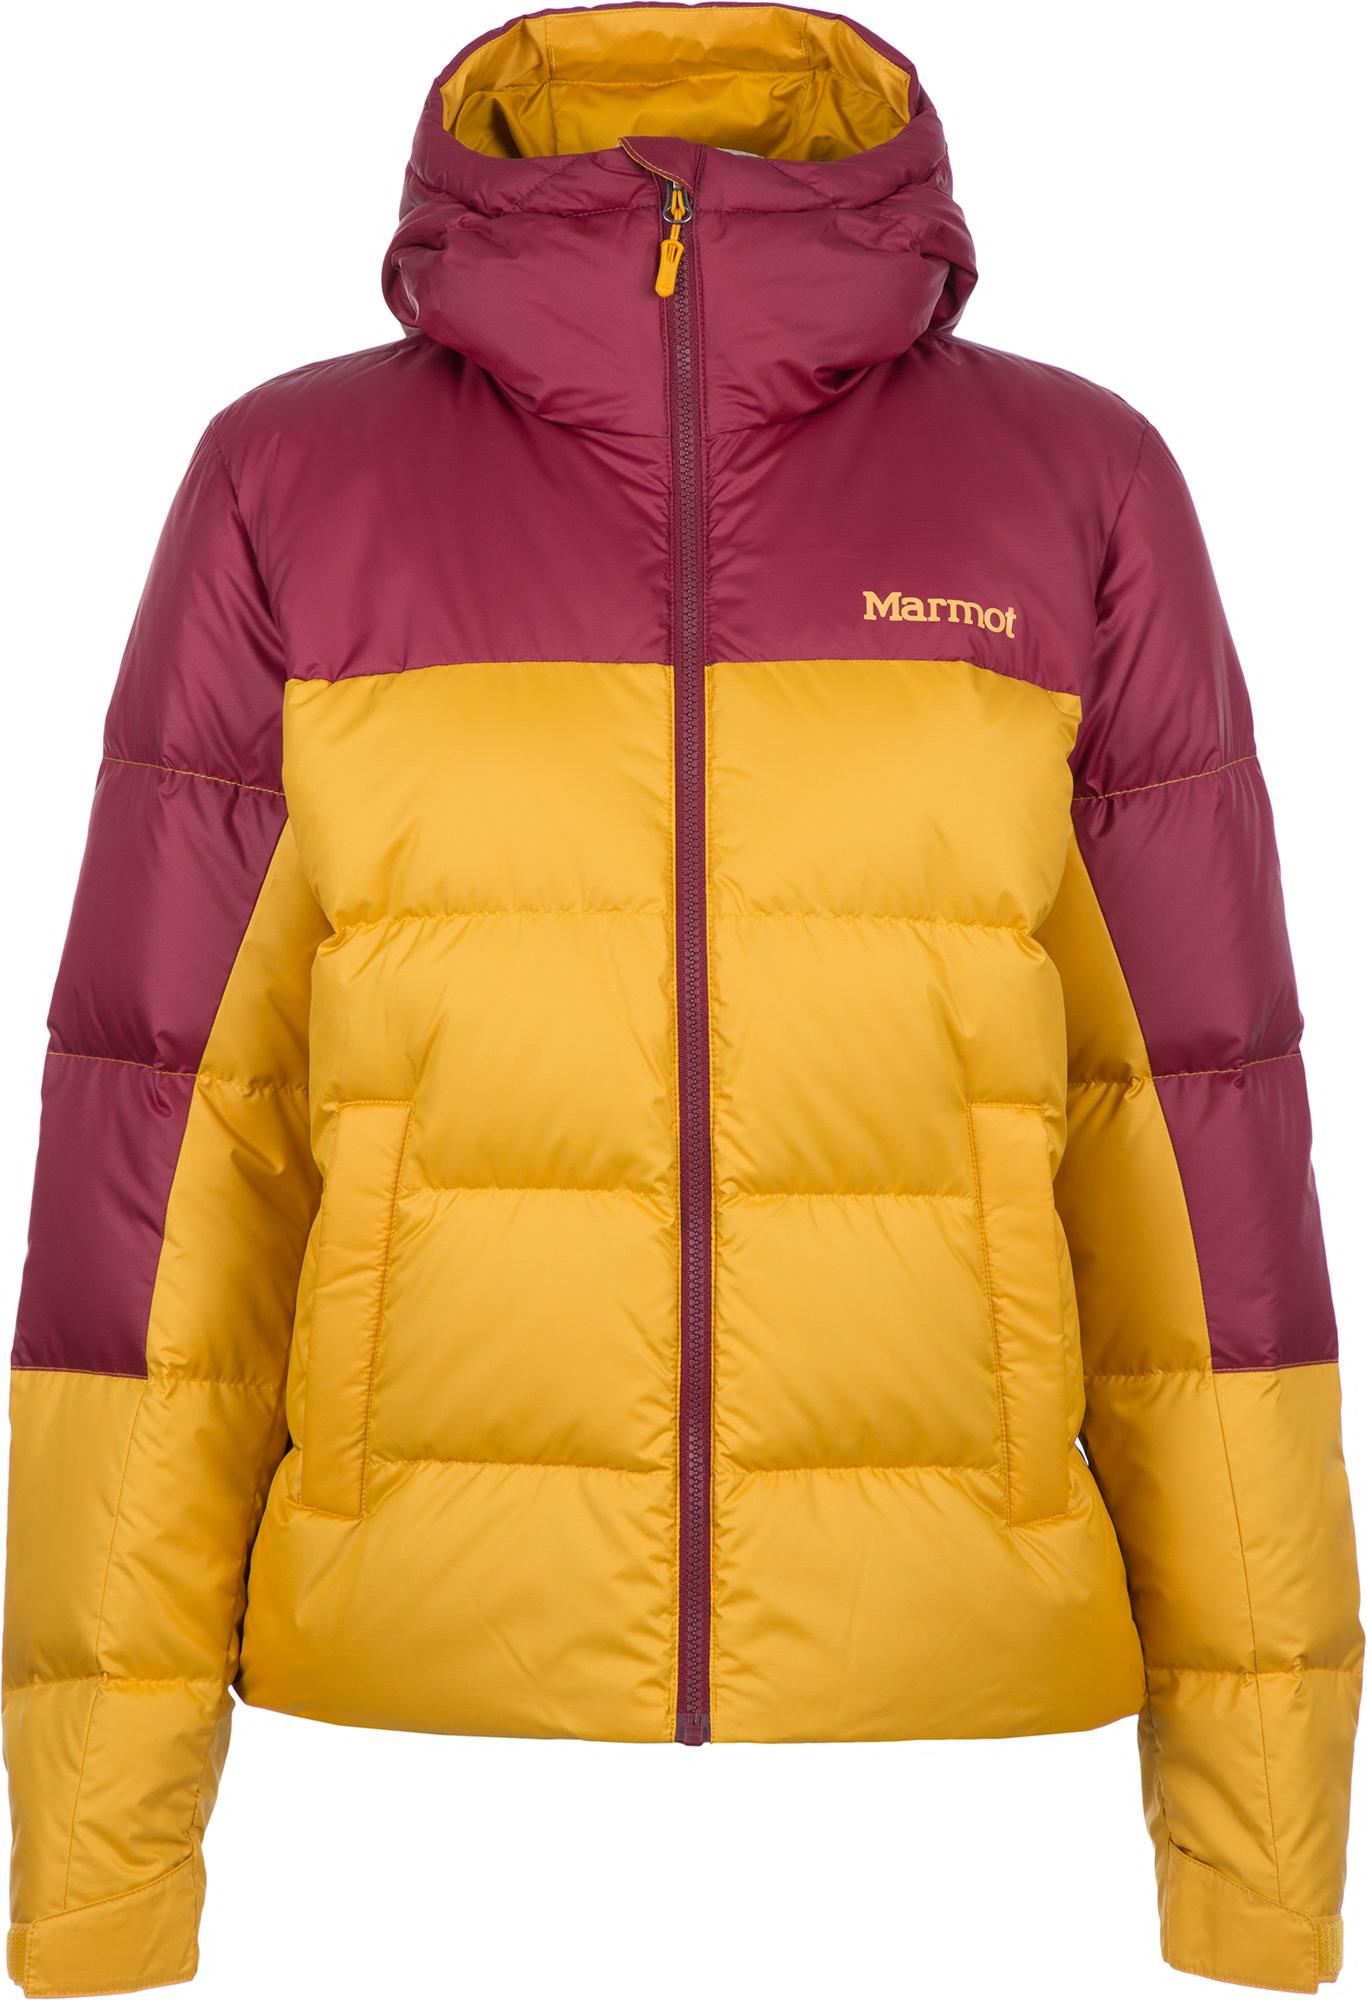 Marmot Пуховик женский Marmot Guides Down Hoody, размер 46-48